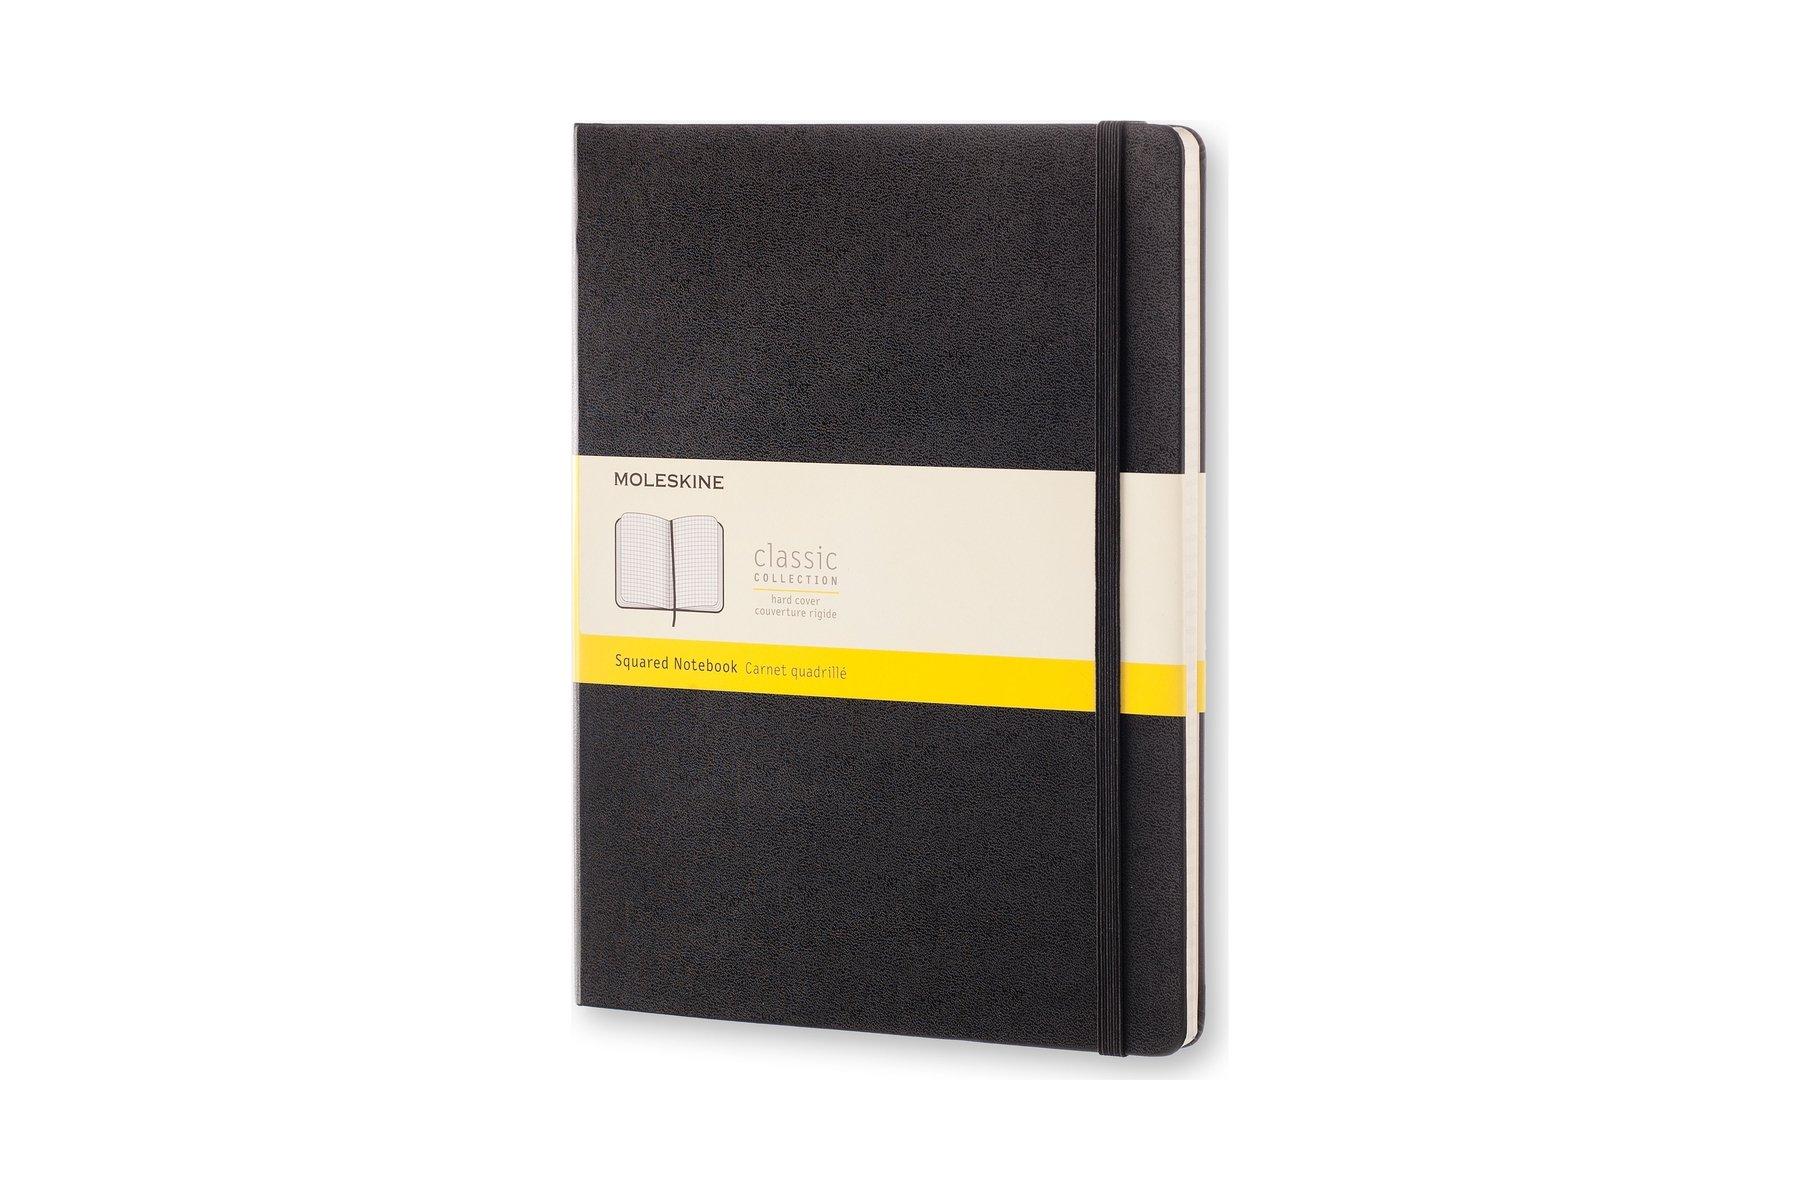 Moleskine Classic Notebook, Extra Large, Squared, Black